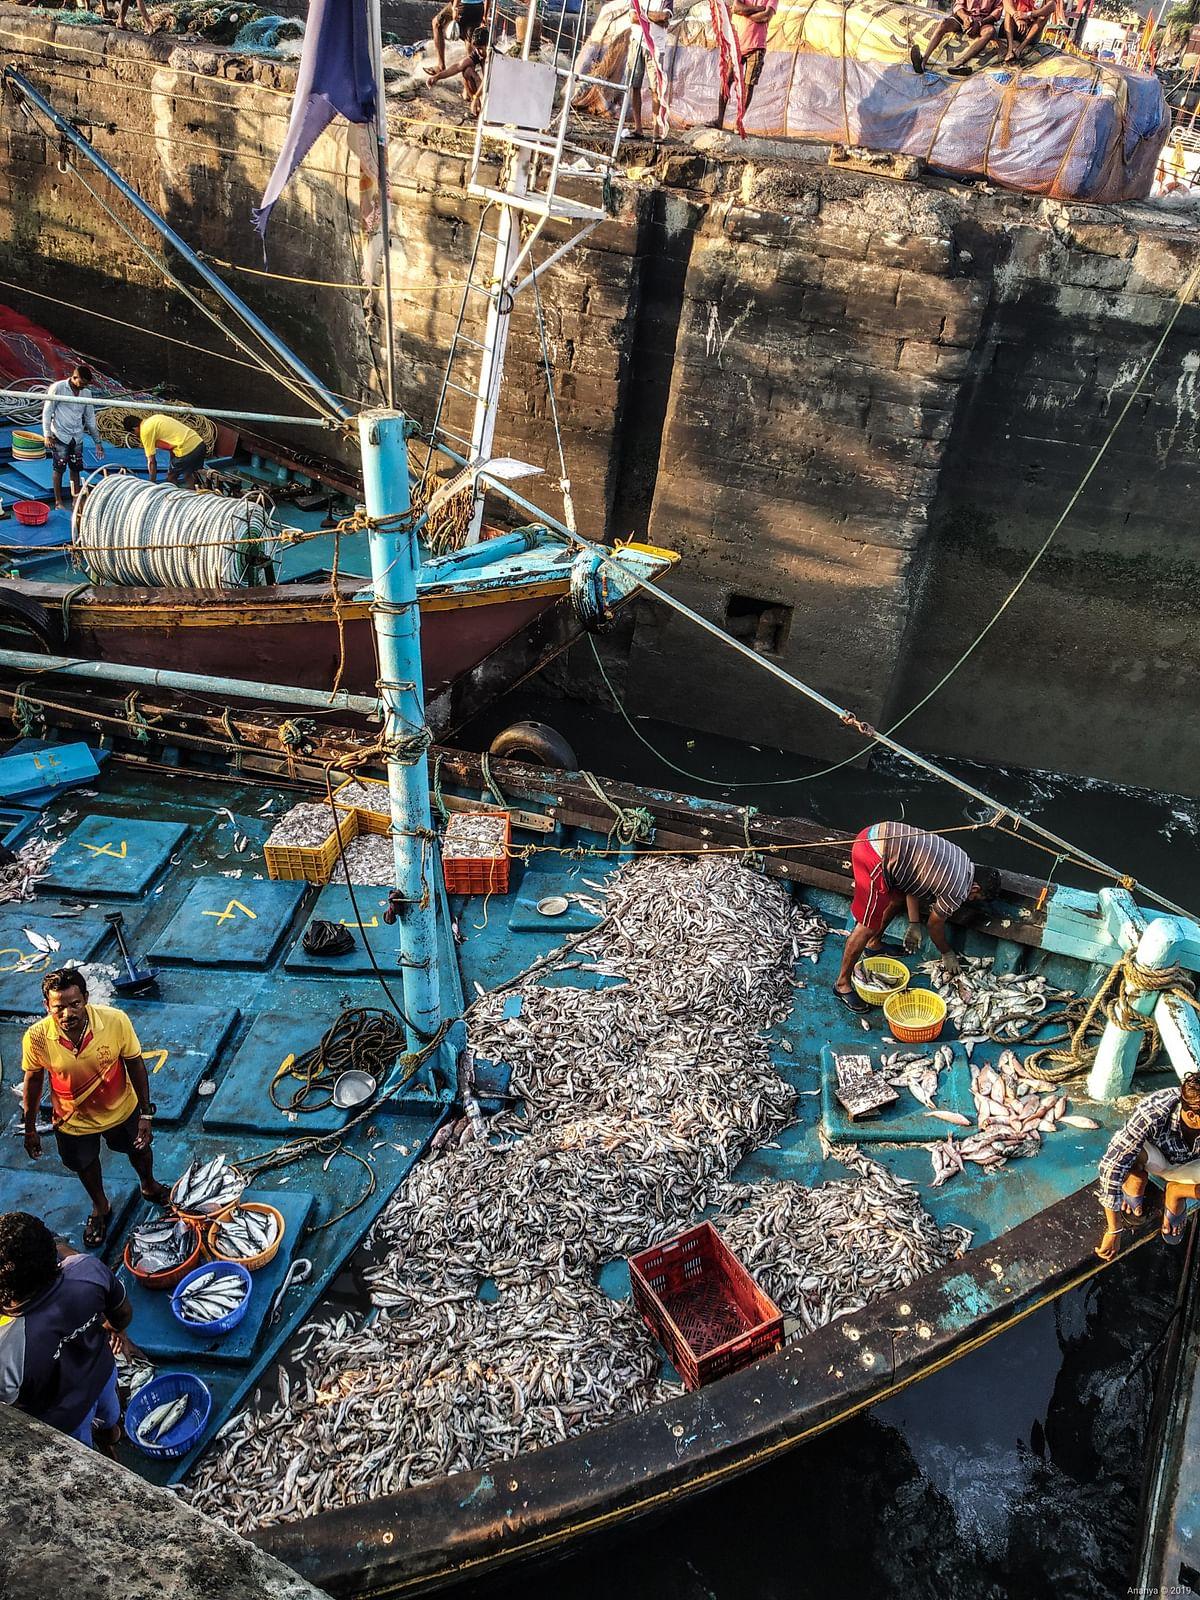 Mumbai's fishermen are turning 'Aapada' into 'Aavsar'